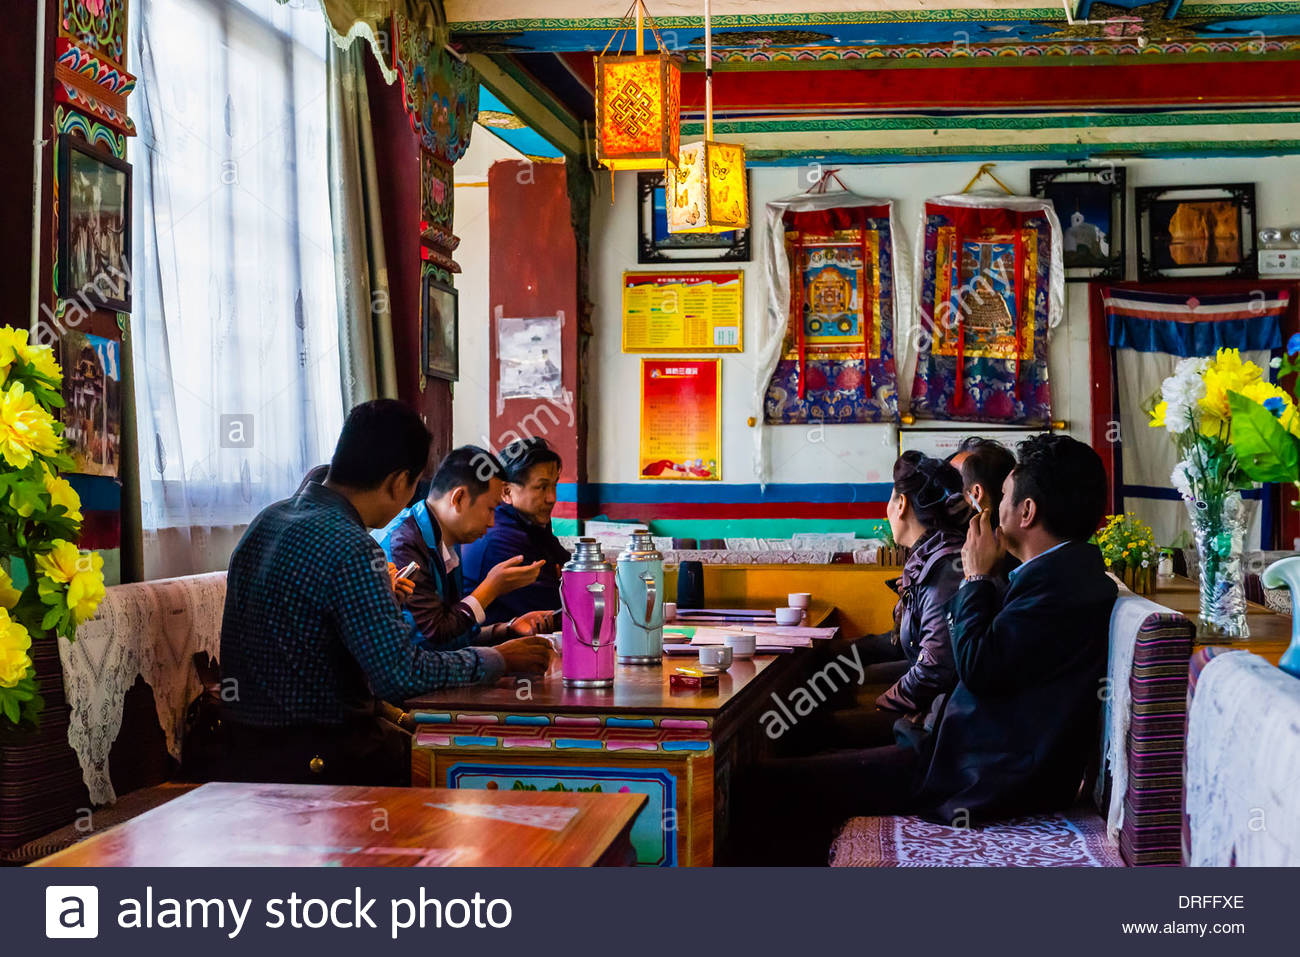 Le peuple chinois de manger le déjeuner, Tashi Restaurant, Tsedang, Xizang (Tibet), la Chine. Photo Stock